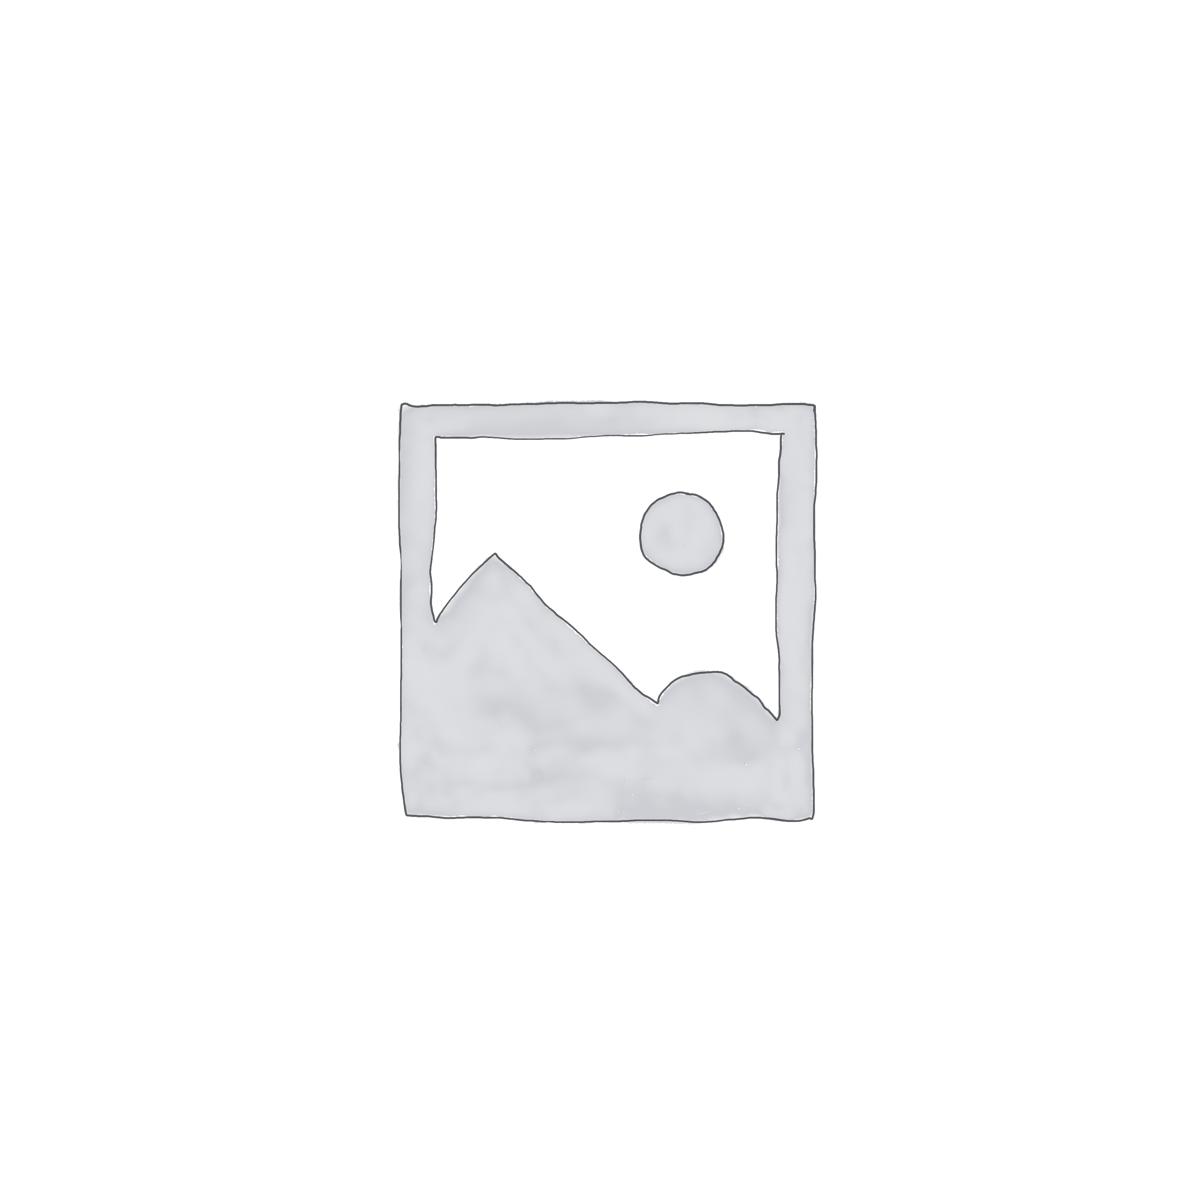 Magnolia Blossom with Column Wallpaper Mural